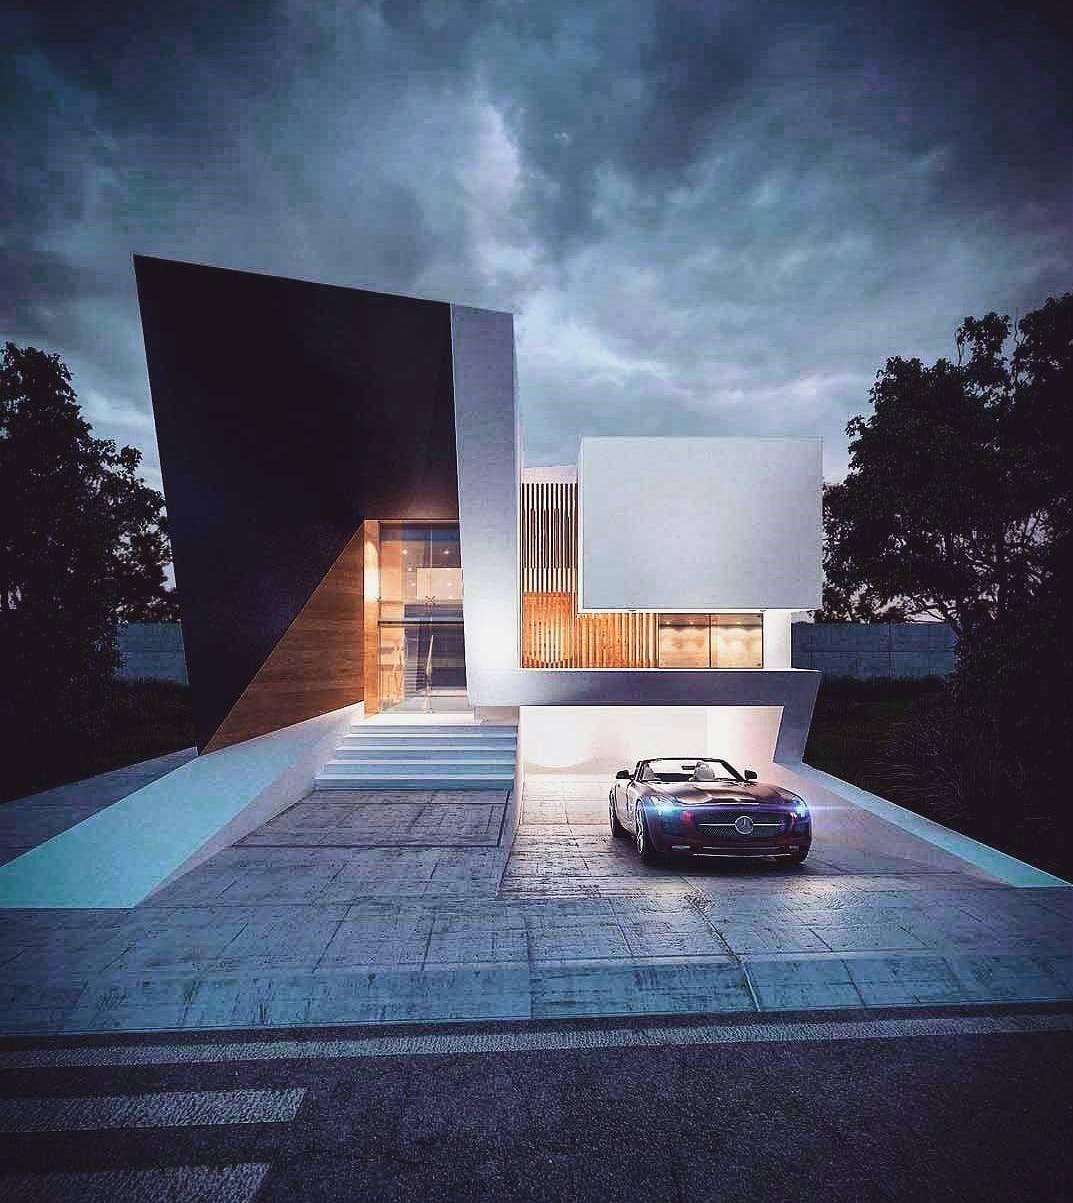 Inspiration __ #thegoa #goaschool #cgart #architecture #archviz ...